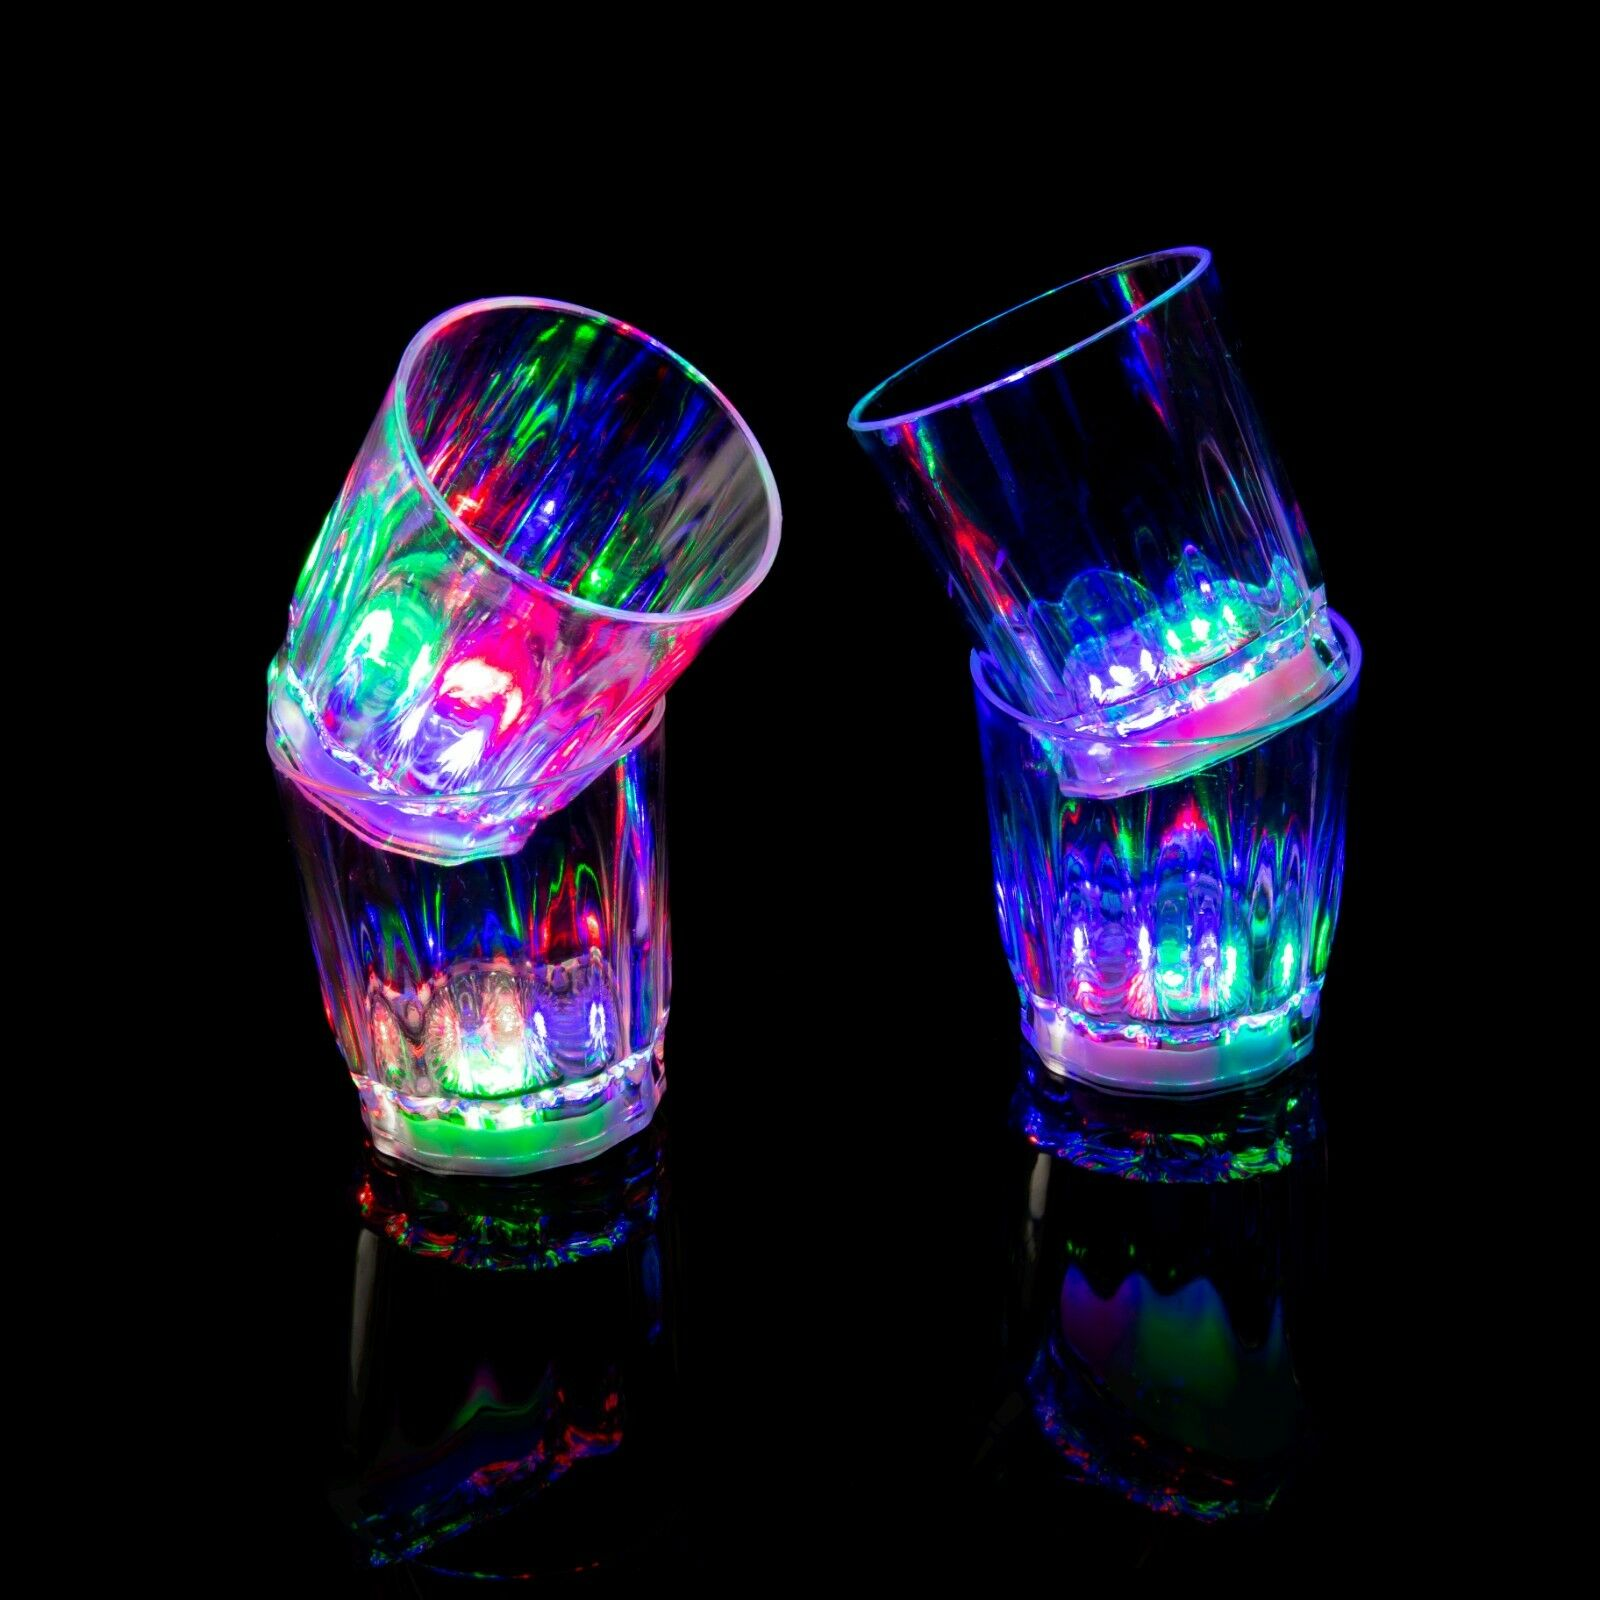 96 LED Intermitente Plástico Vasos de Chupito Luz Luminoso Barware Fiesta Boda Reino Unido